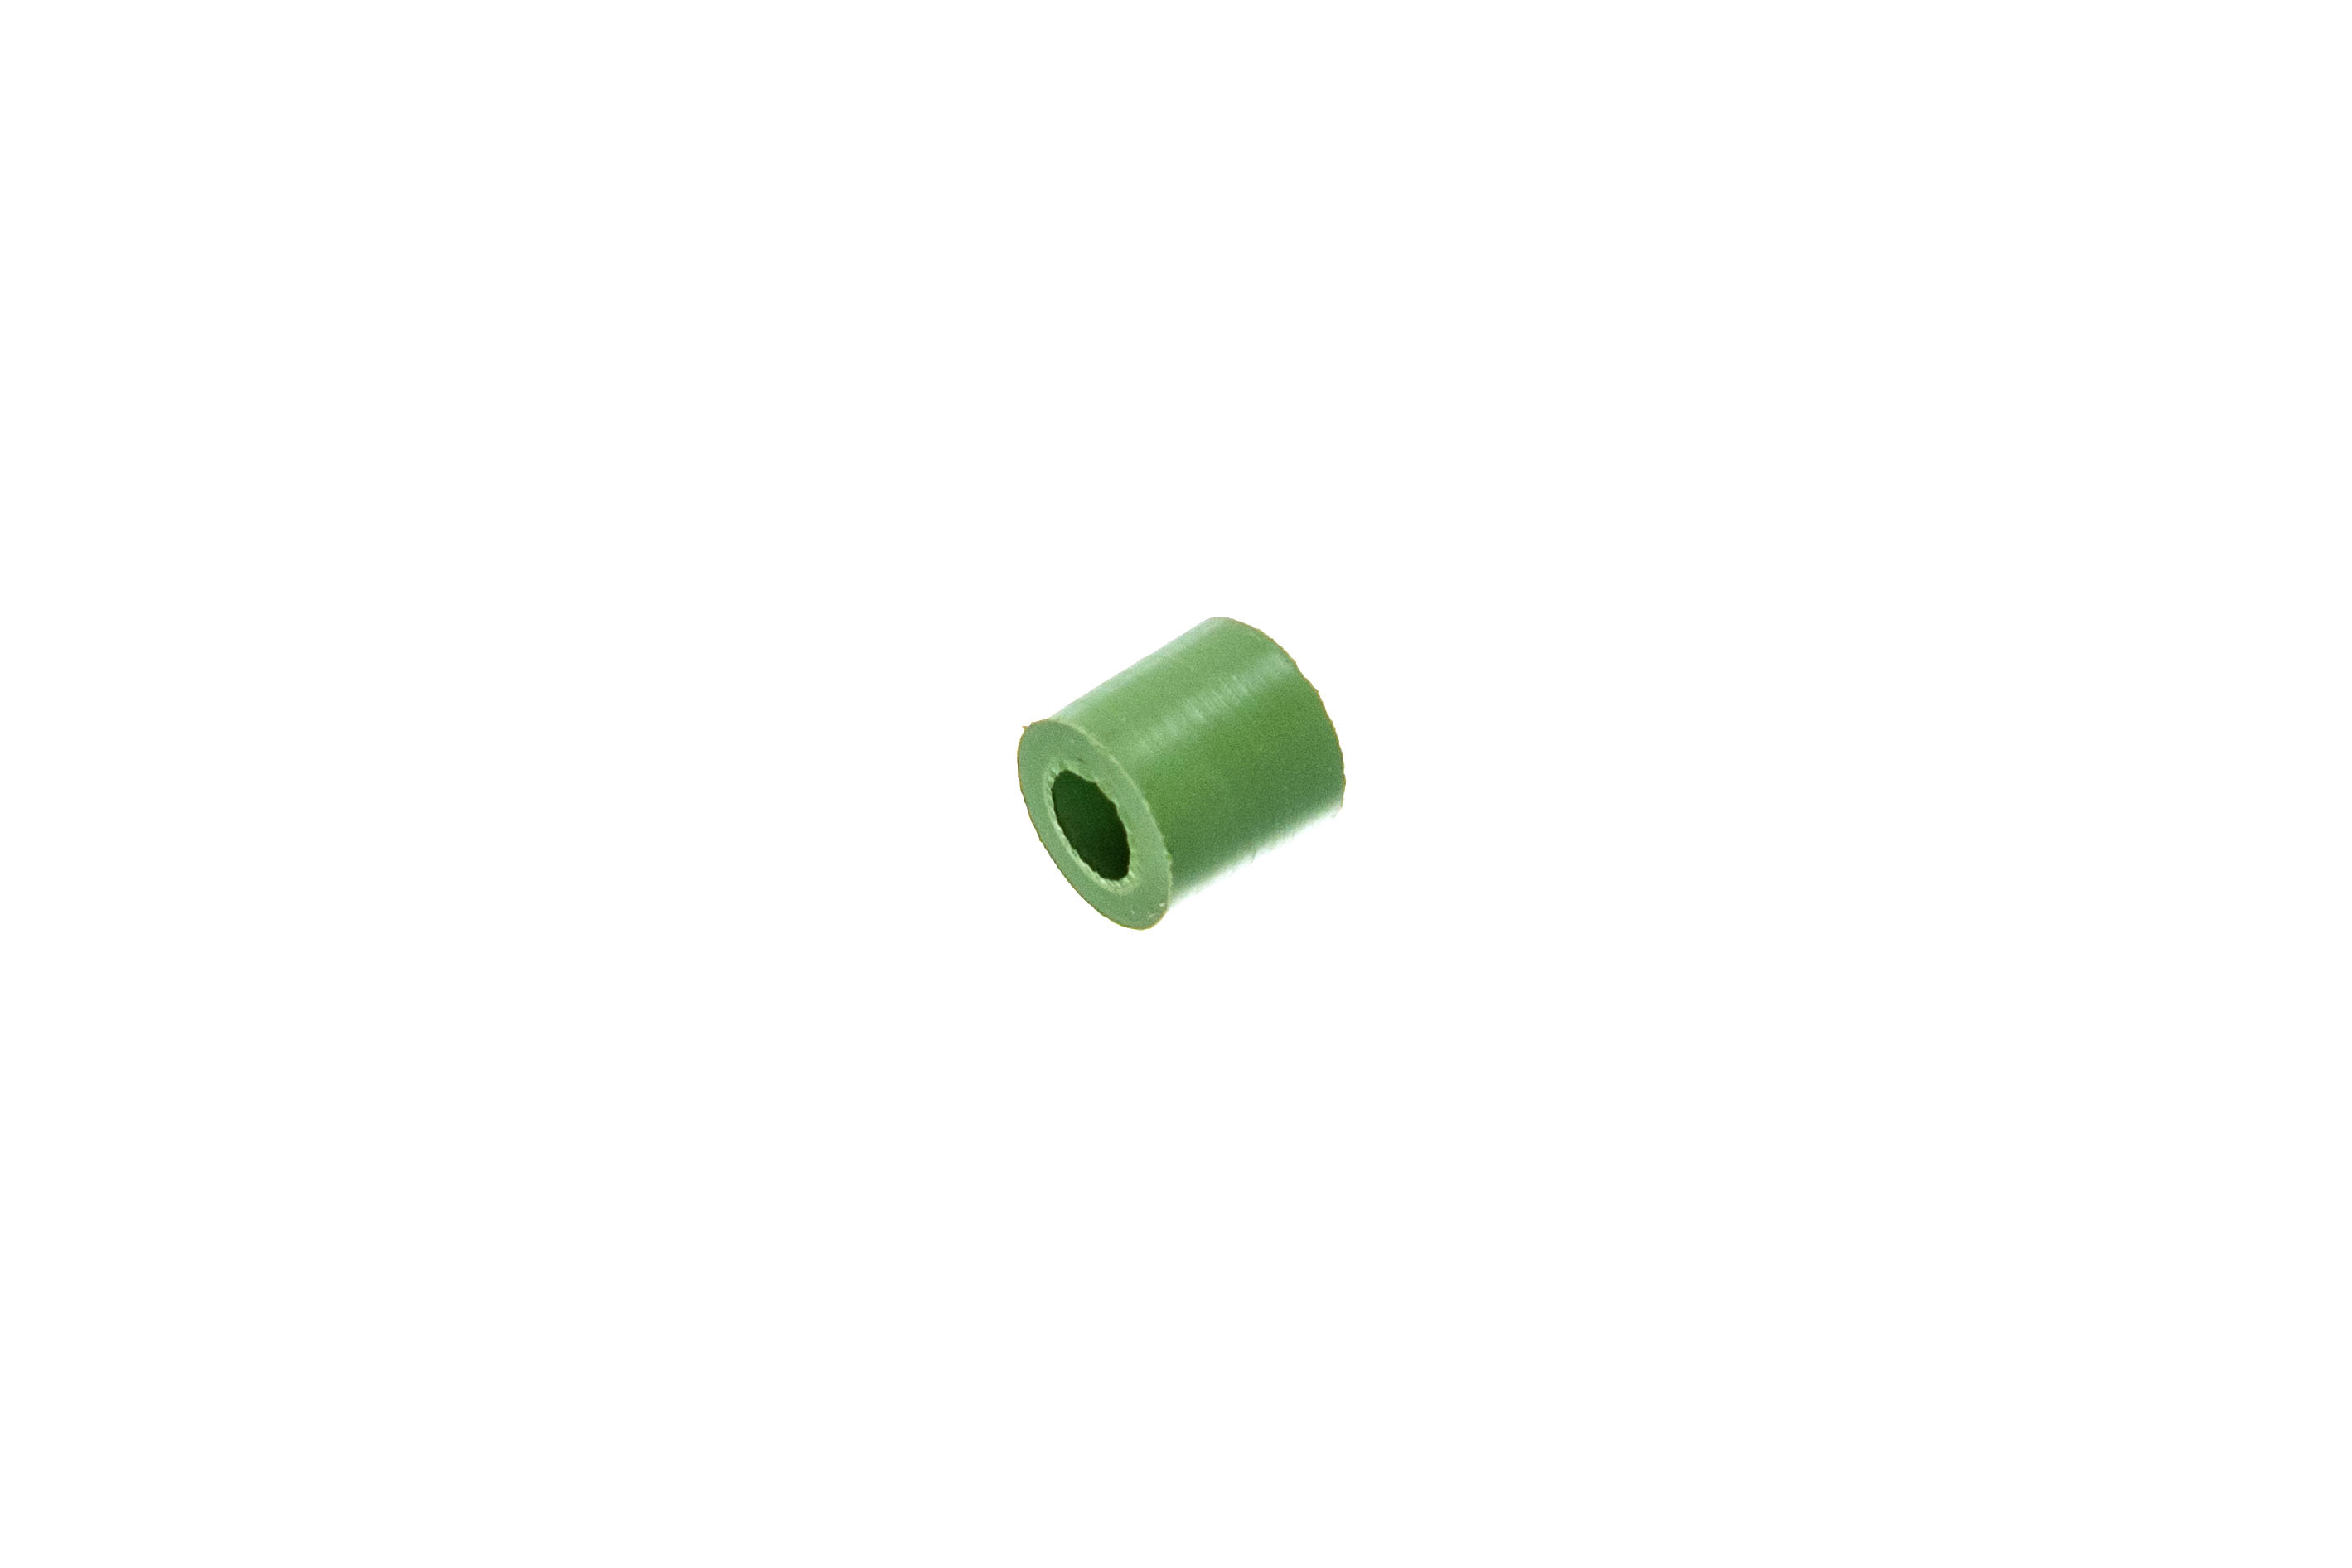 Impulzná hadička pre HUSQVARNA 36 40 41 45 51 55 240R - 505 31 07-51